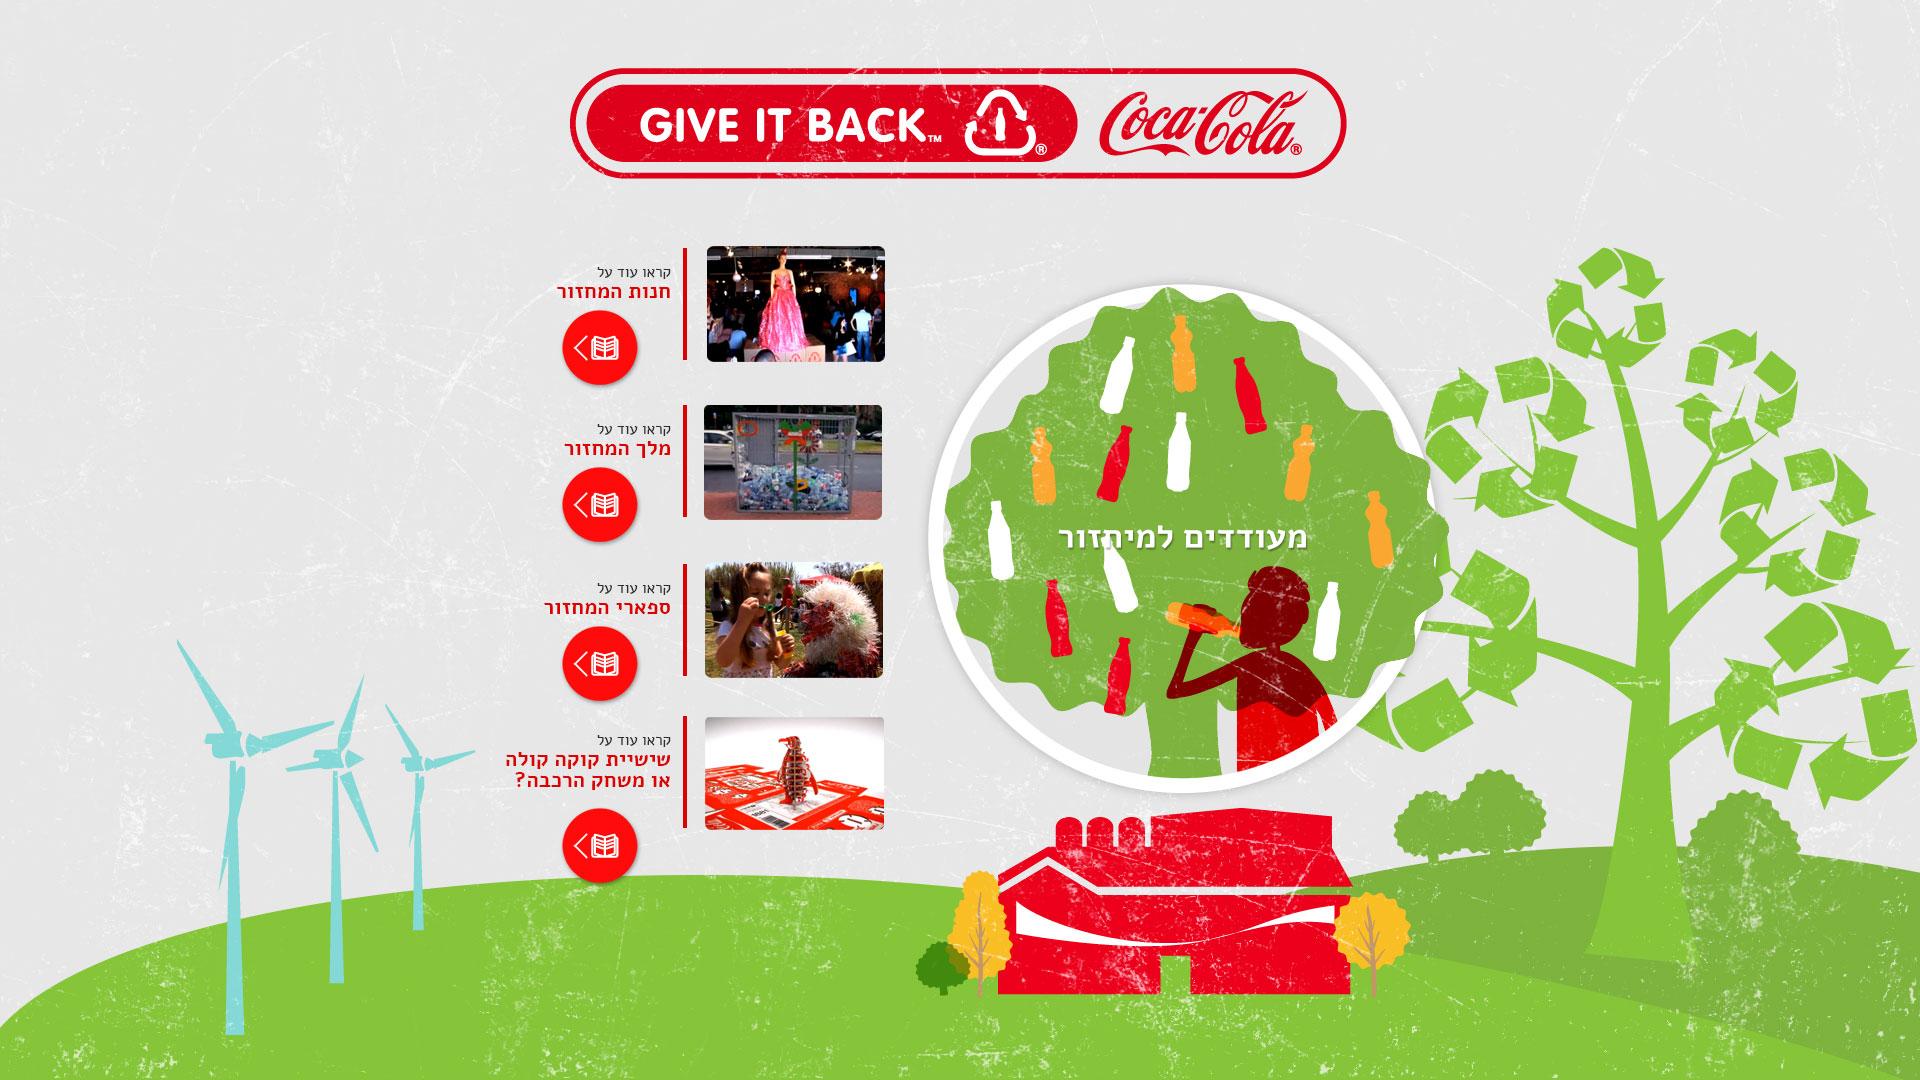 Coca Cola social responsibility website design קוקה קולה עיצוב אתר אחריות חברתית 6